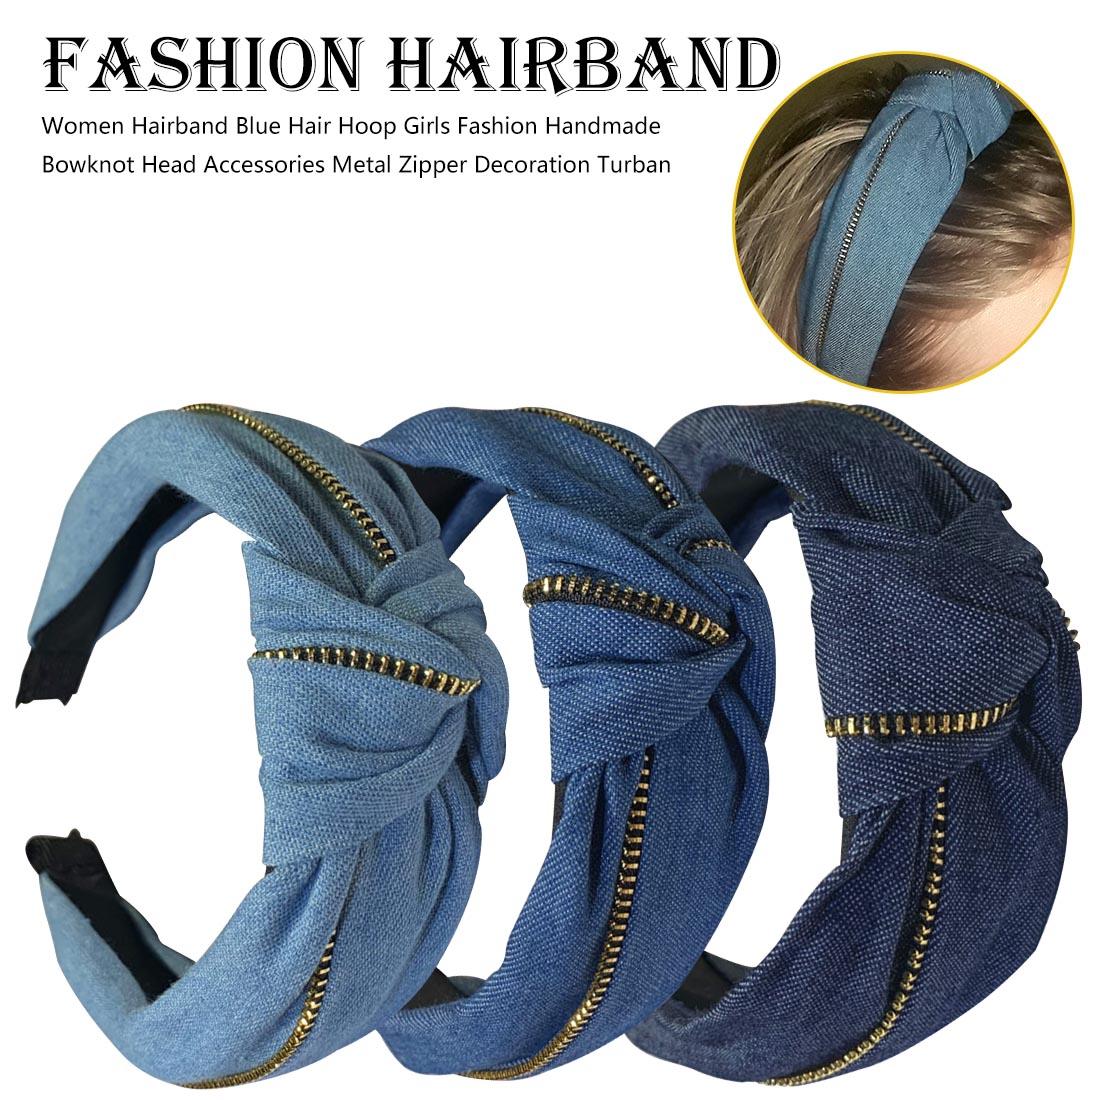 Jeans Wide Headband Women Denim Korean Style Elastic Hair Band Girls Turban Hair Hoop Headband Hairbands For Hair Accessories bed making tools